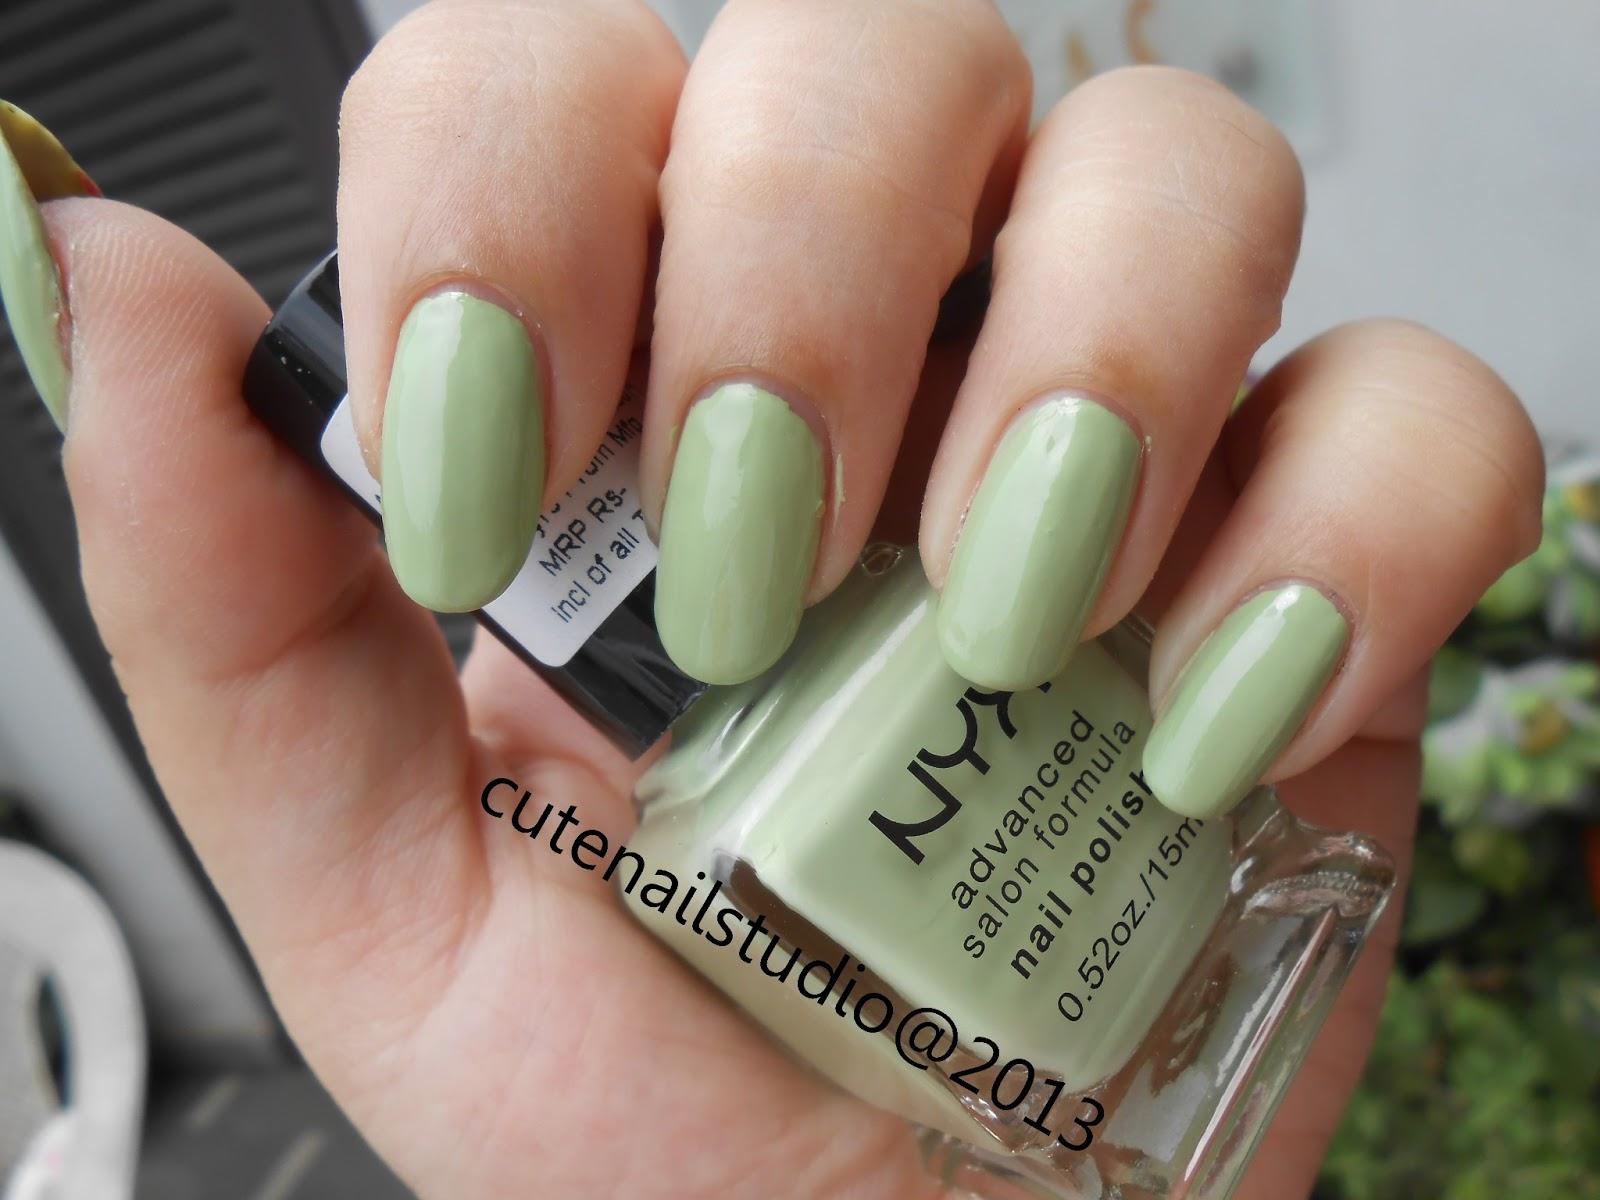 Cute nails: Stone marble nails